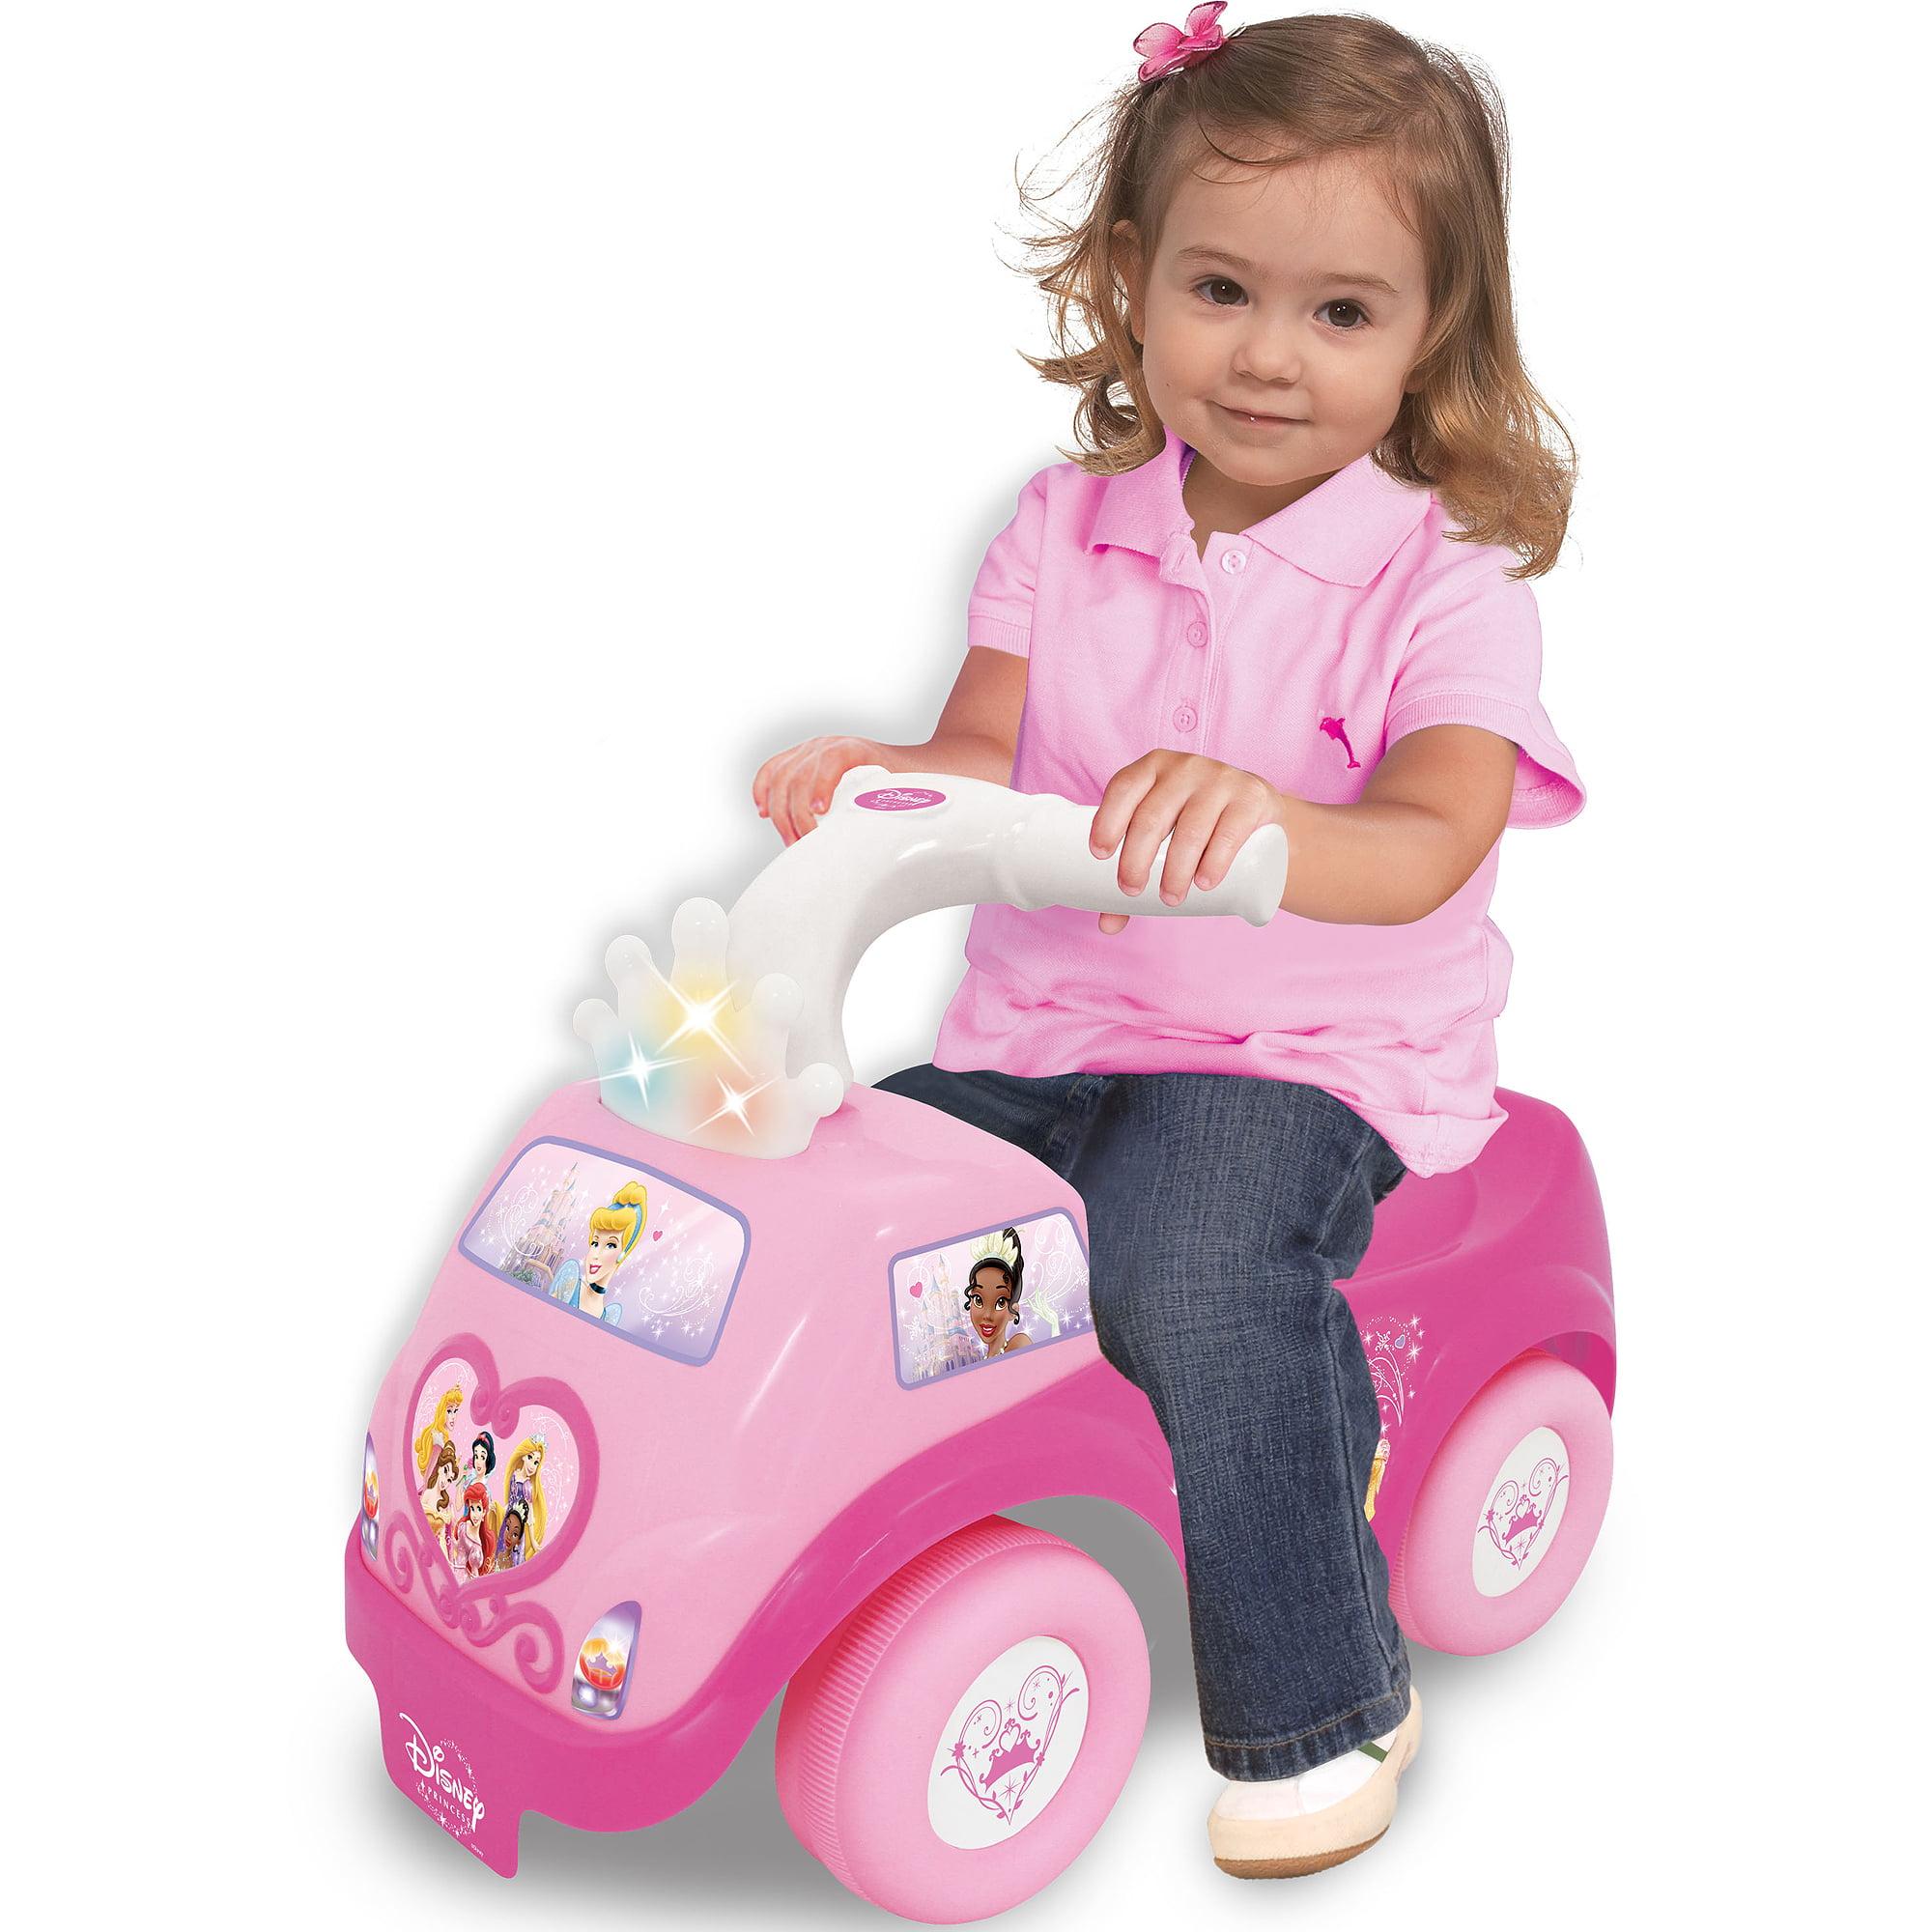 Kiddieland Disney Princess Light 'n Sound Ride-On